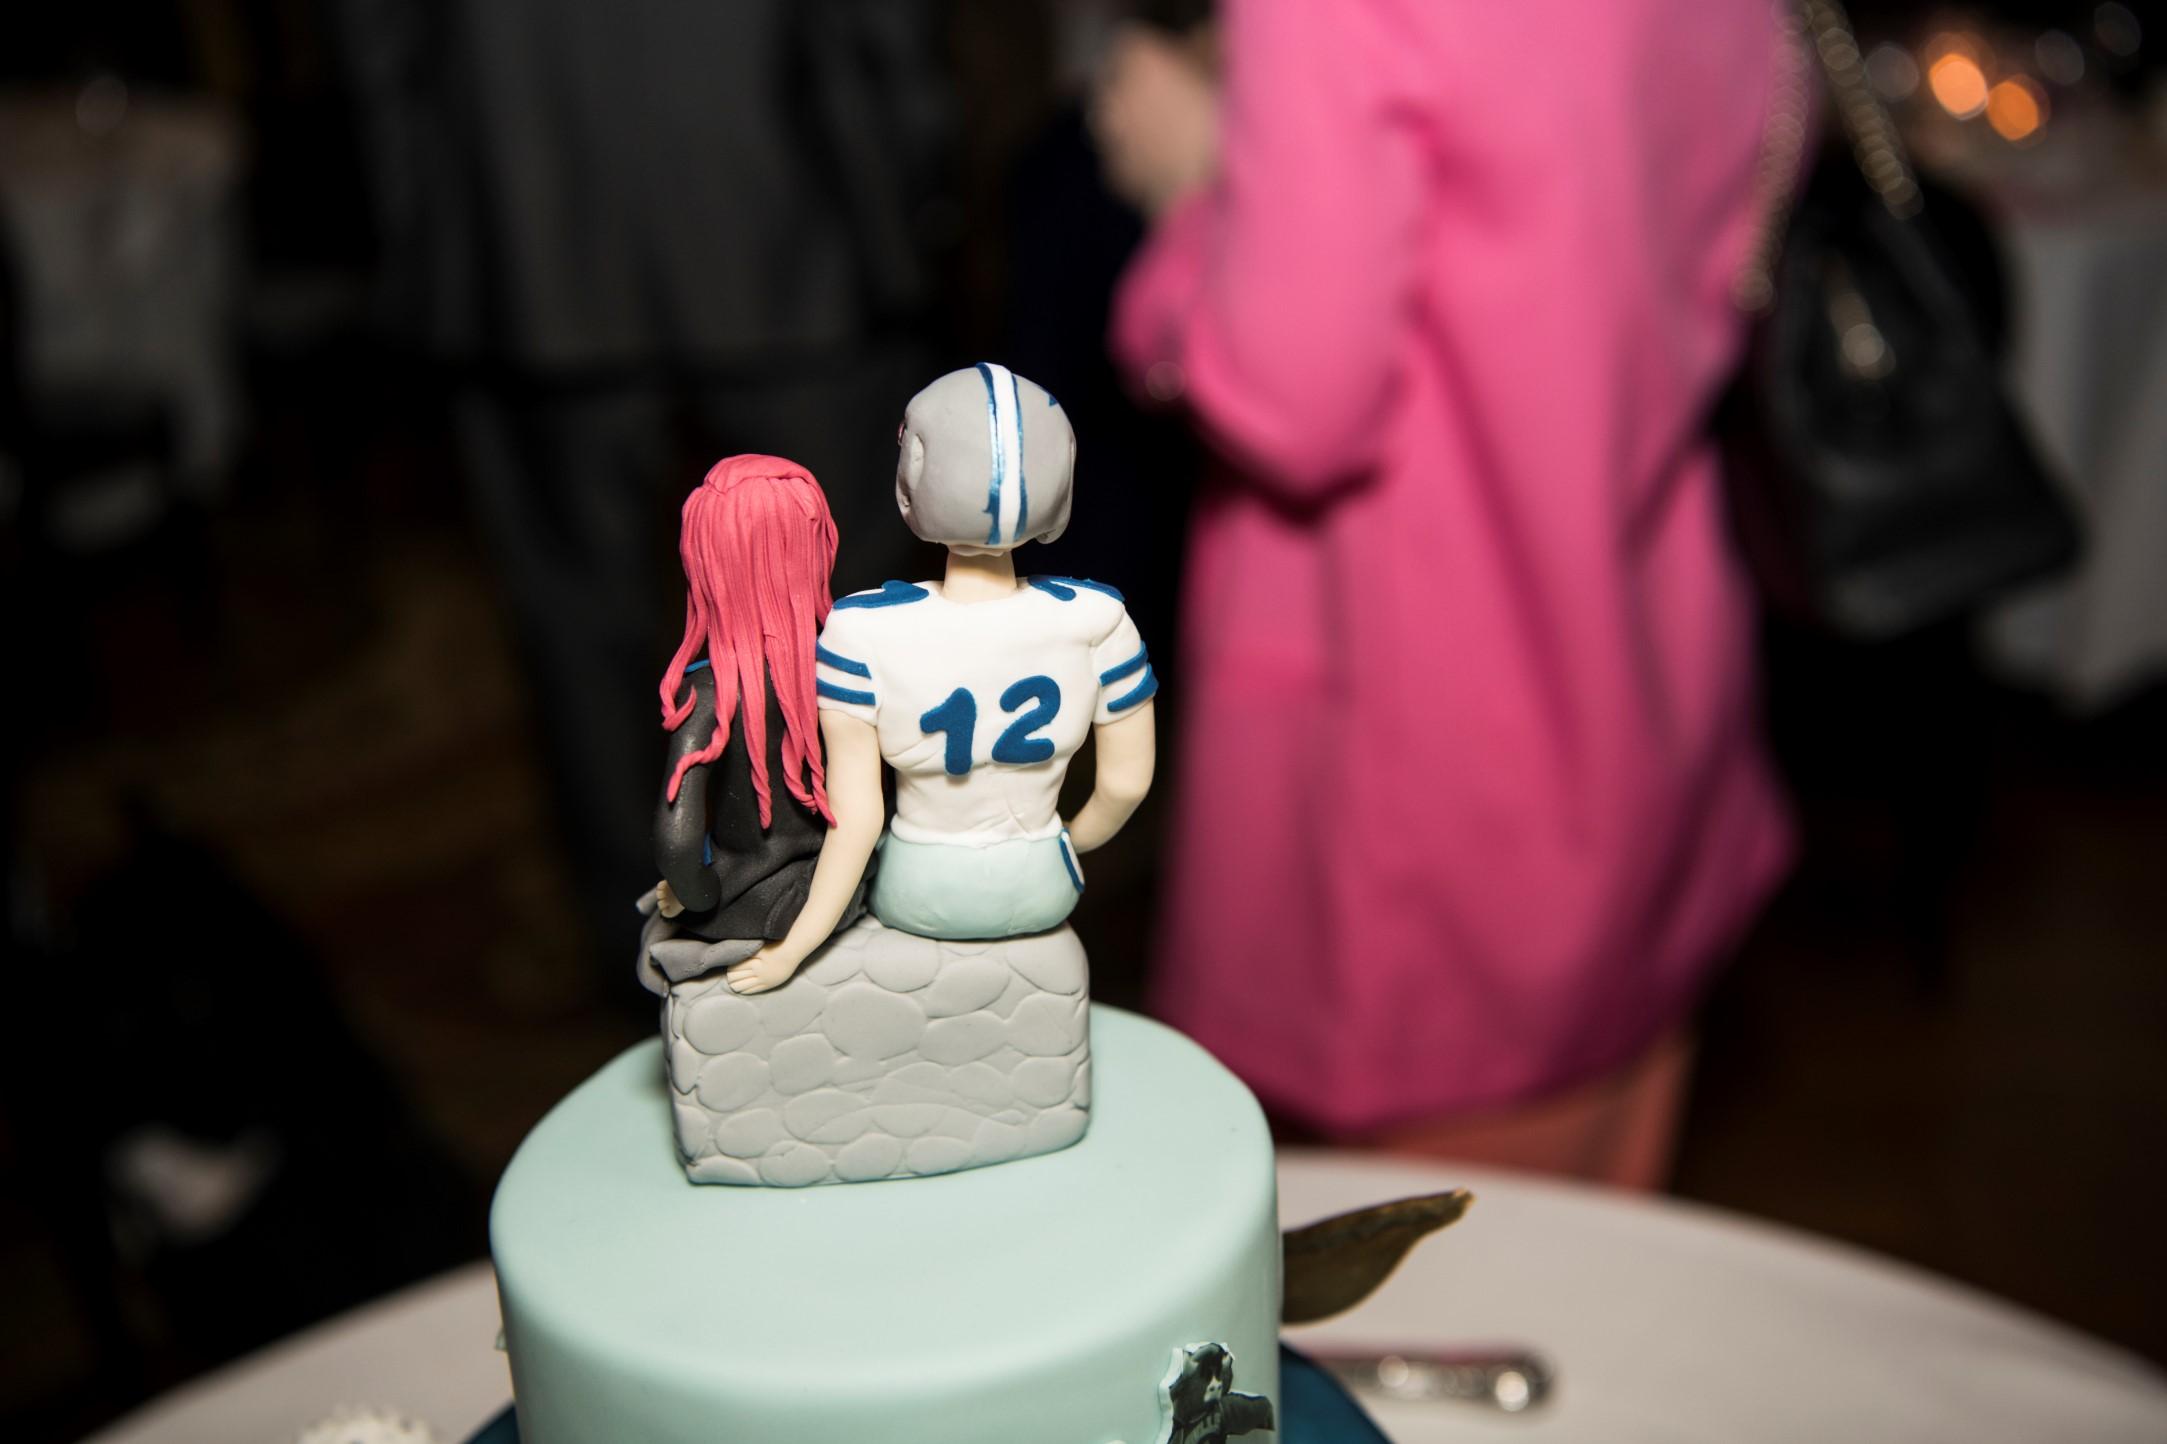 Zoo Wedding- Emma May Photography- Unconventional Wedding- Unique Wedding Inspiration- Harry Potter Wedding Cake